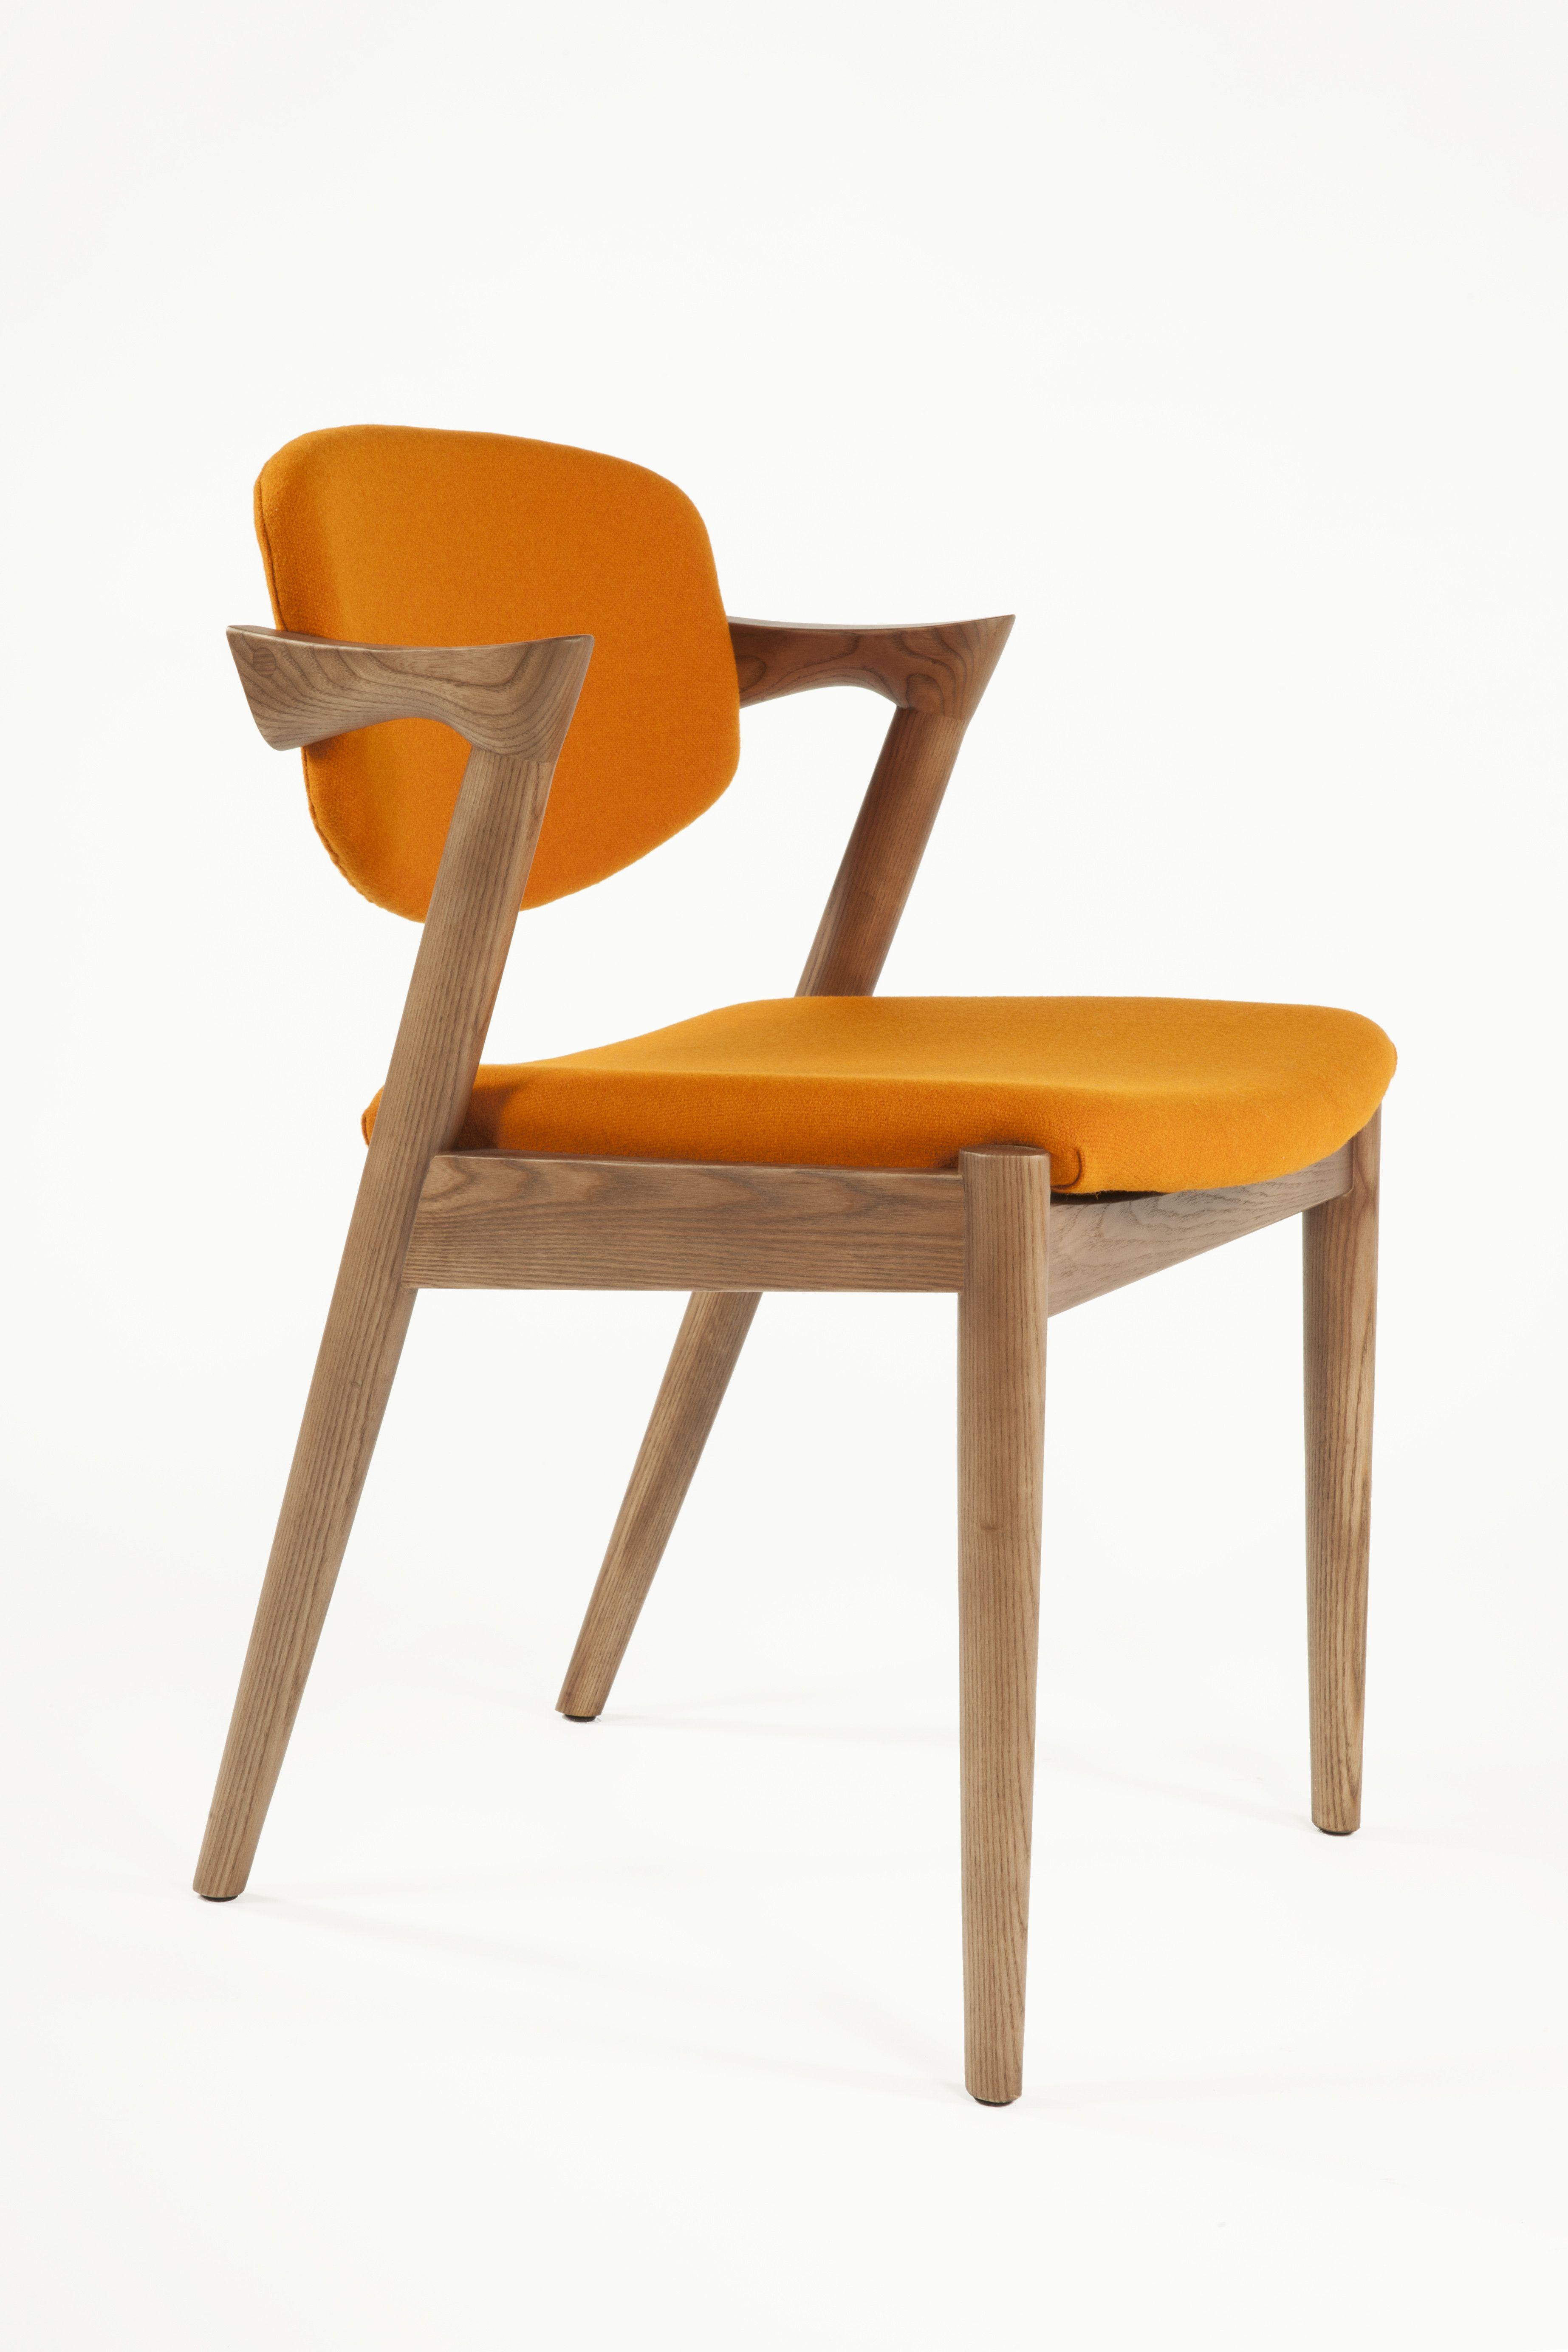 299 Mid Century Modern Reproduction Model 42 Flap Back Dining Chair Orange Inspired By Ka Orange Dining Chairs Midcentury Modern Dining Chairs Dining Chairs